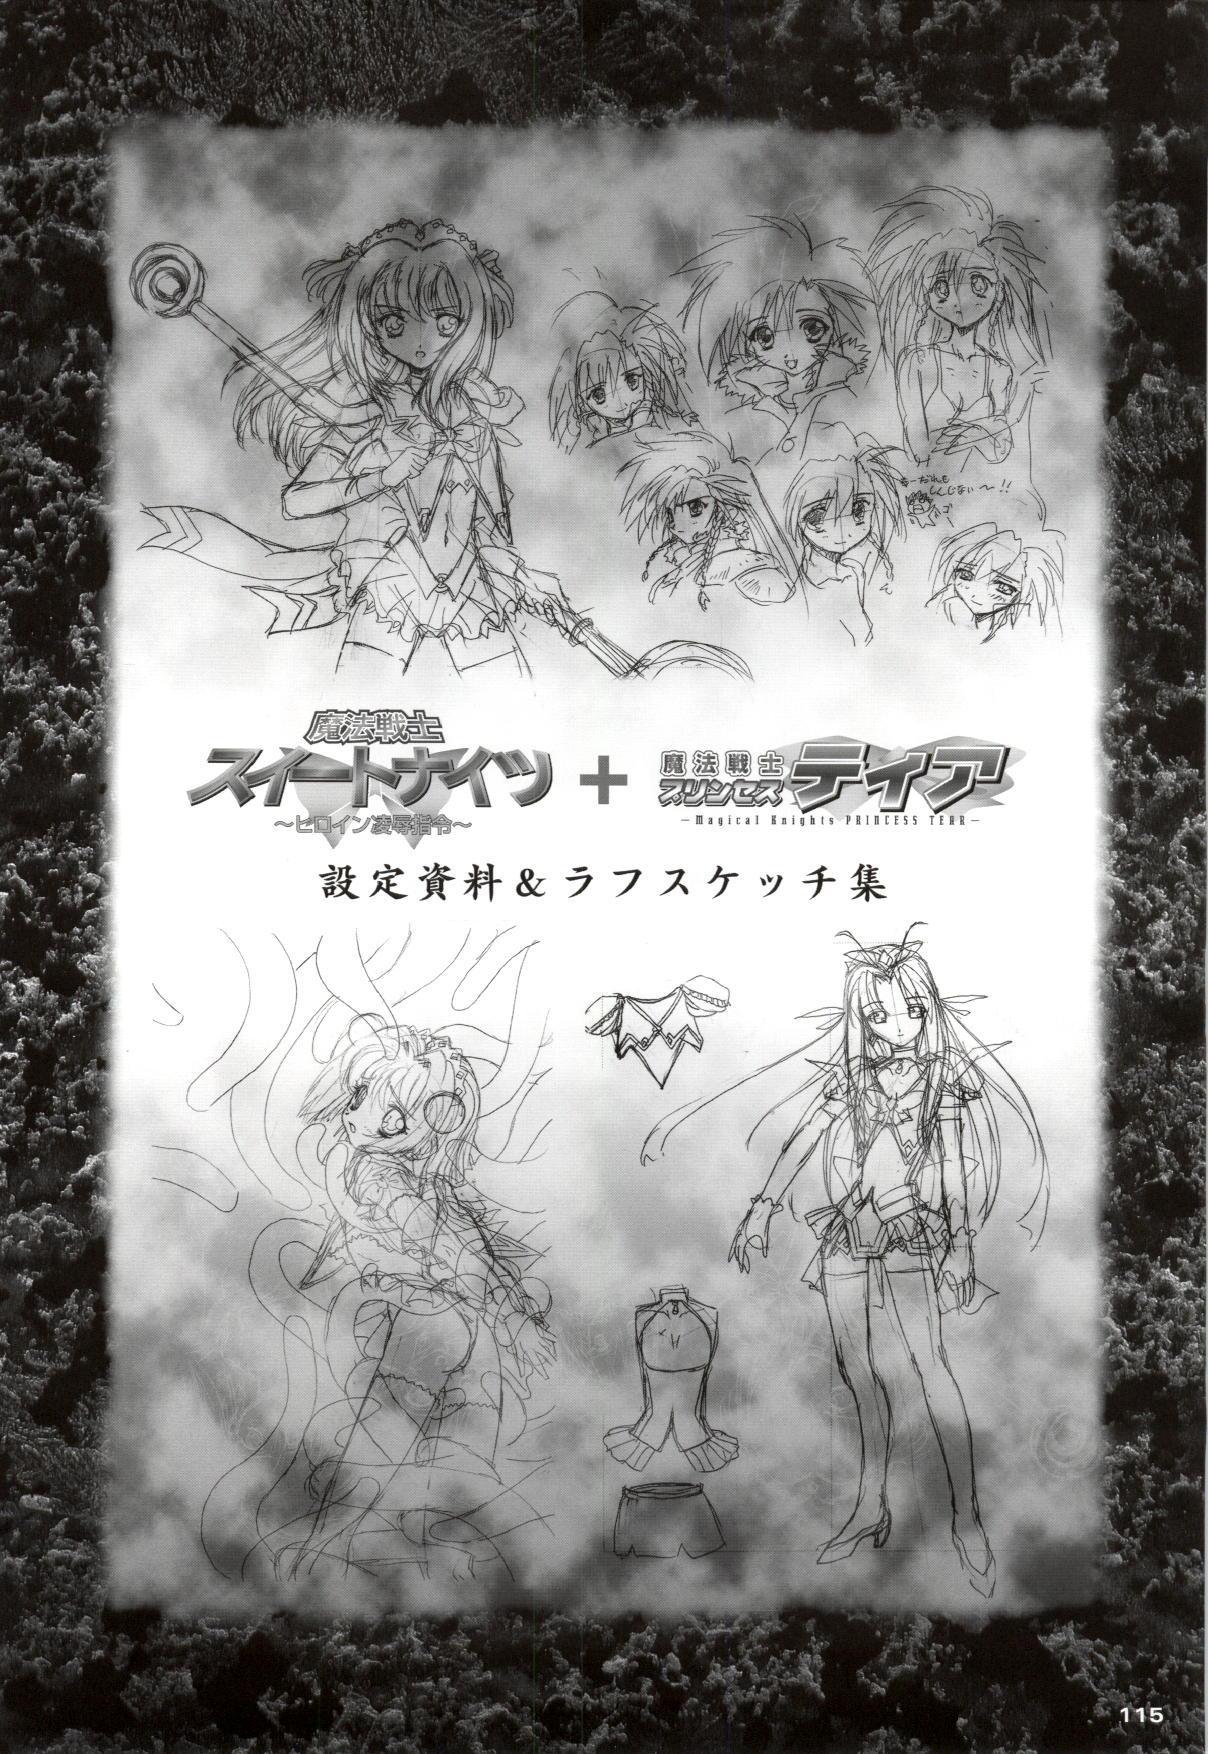 Mahou Senshi Sweet Knight & Mahou Senshi Princess Tear 114